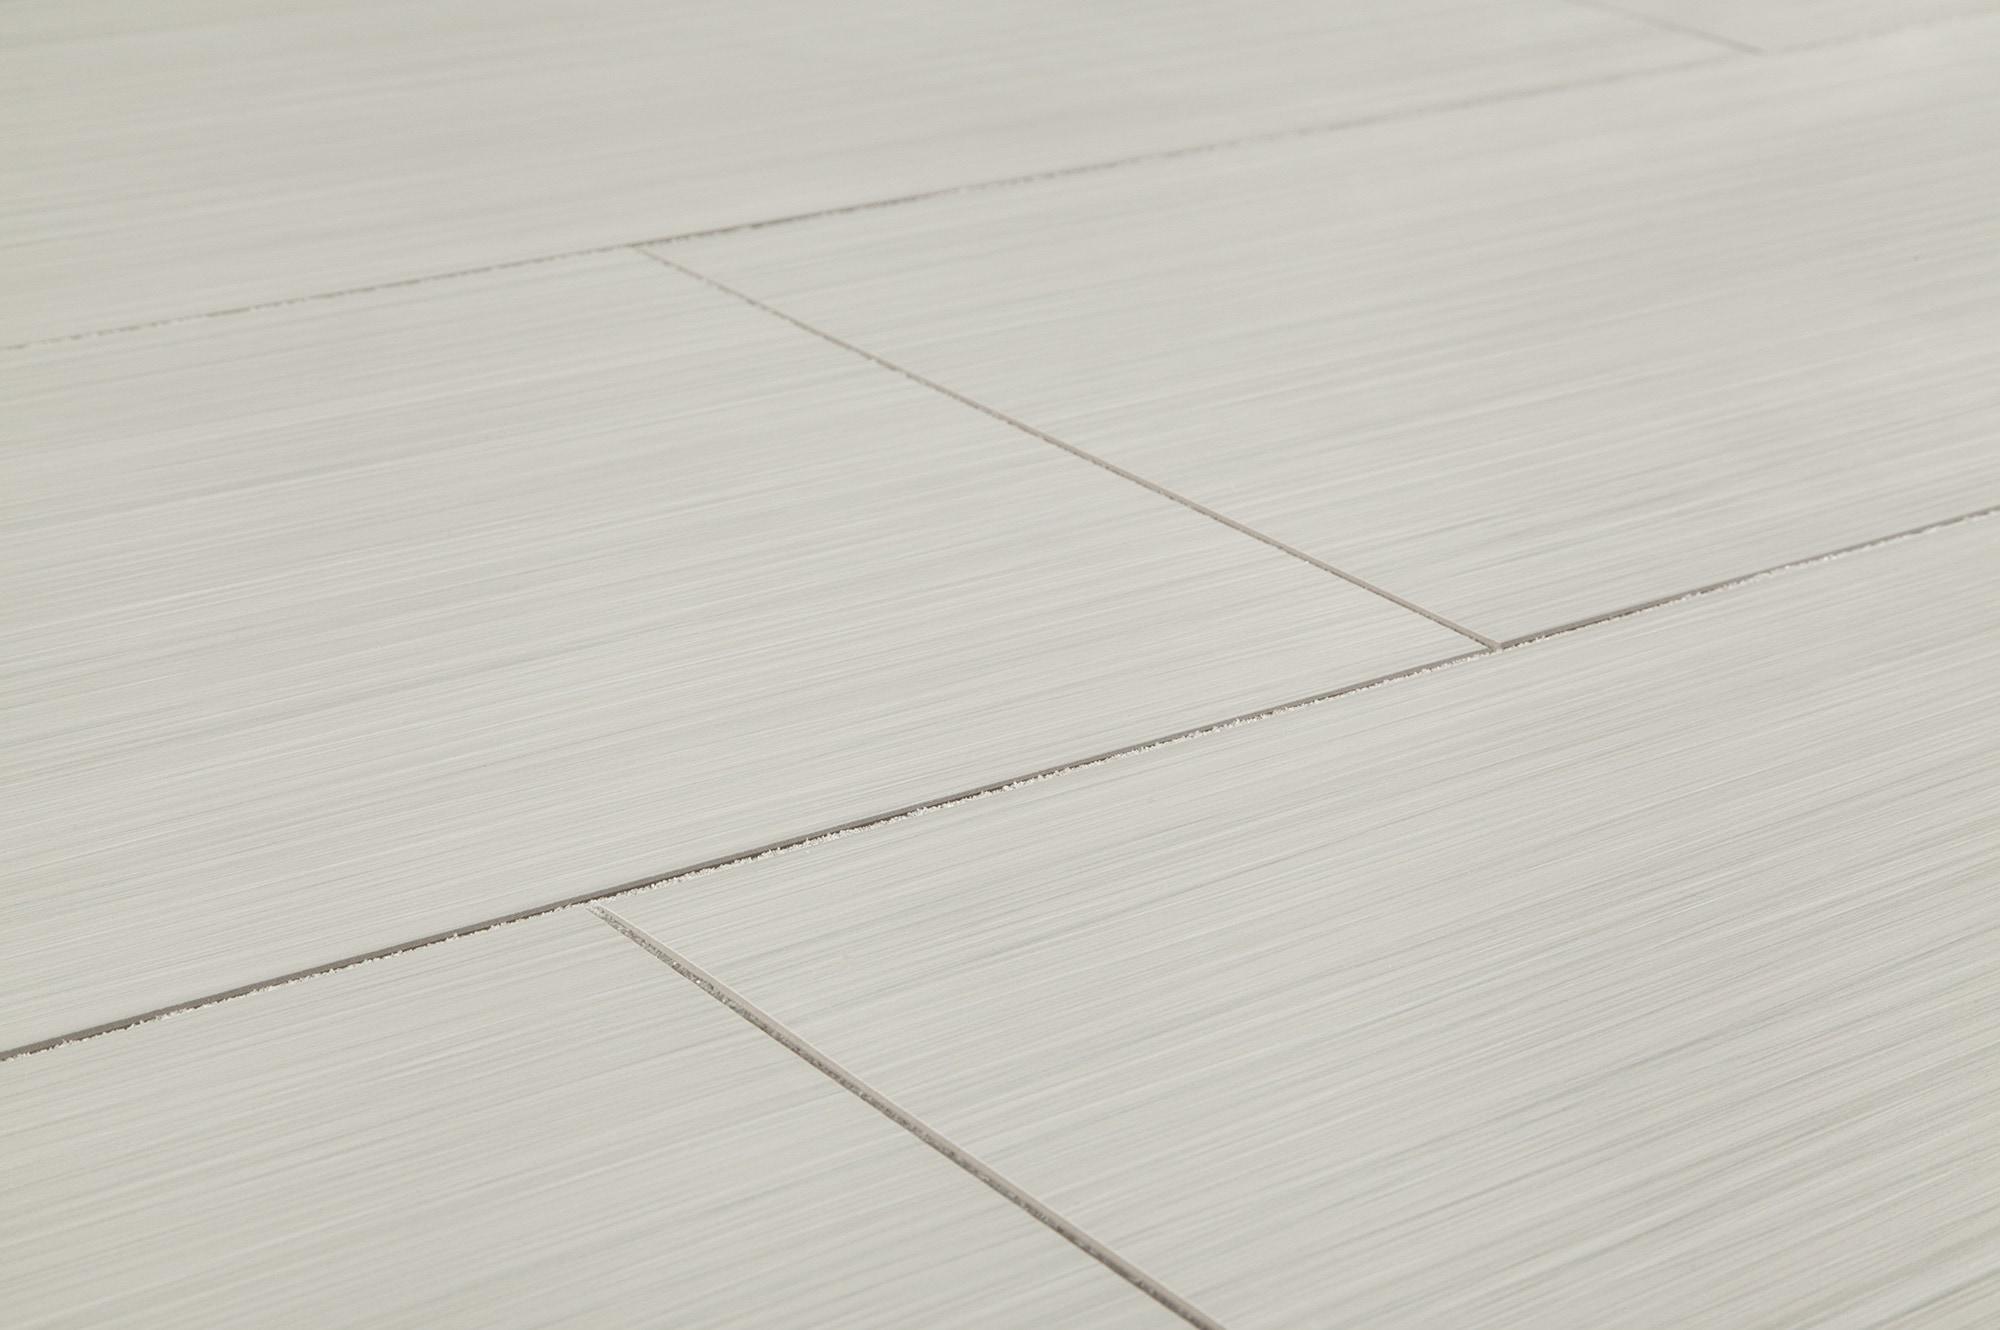 Cosmopolitan 10100094 Salerno Raw Silk Series 12x24 Angle Porcelain Tile Porcelain Tile Counters houzz-02 White Porcelain Tile